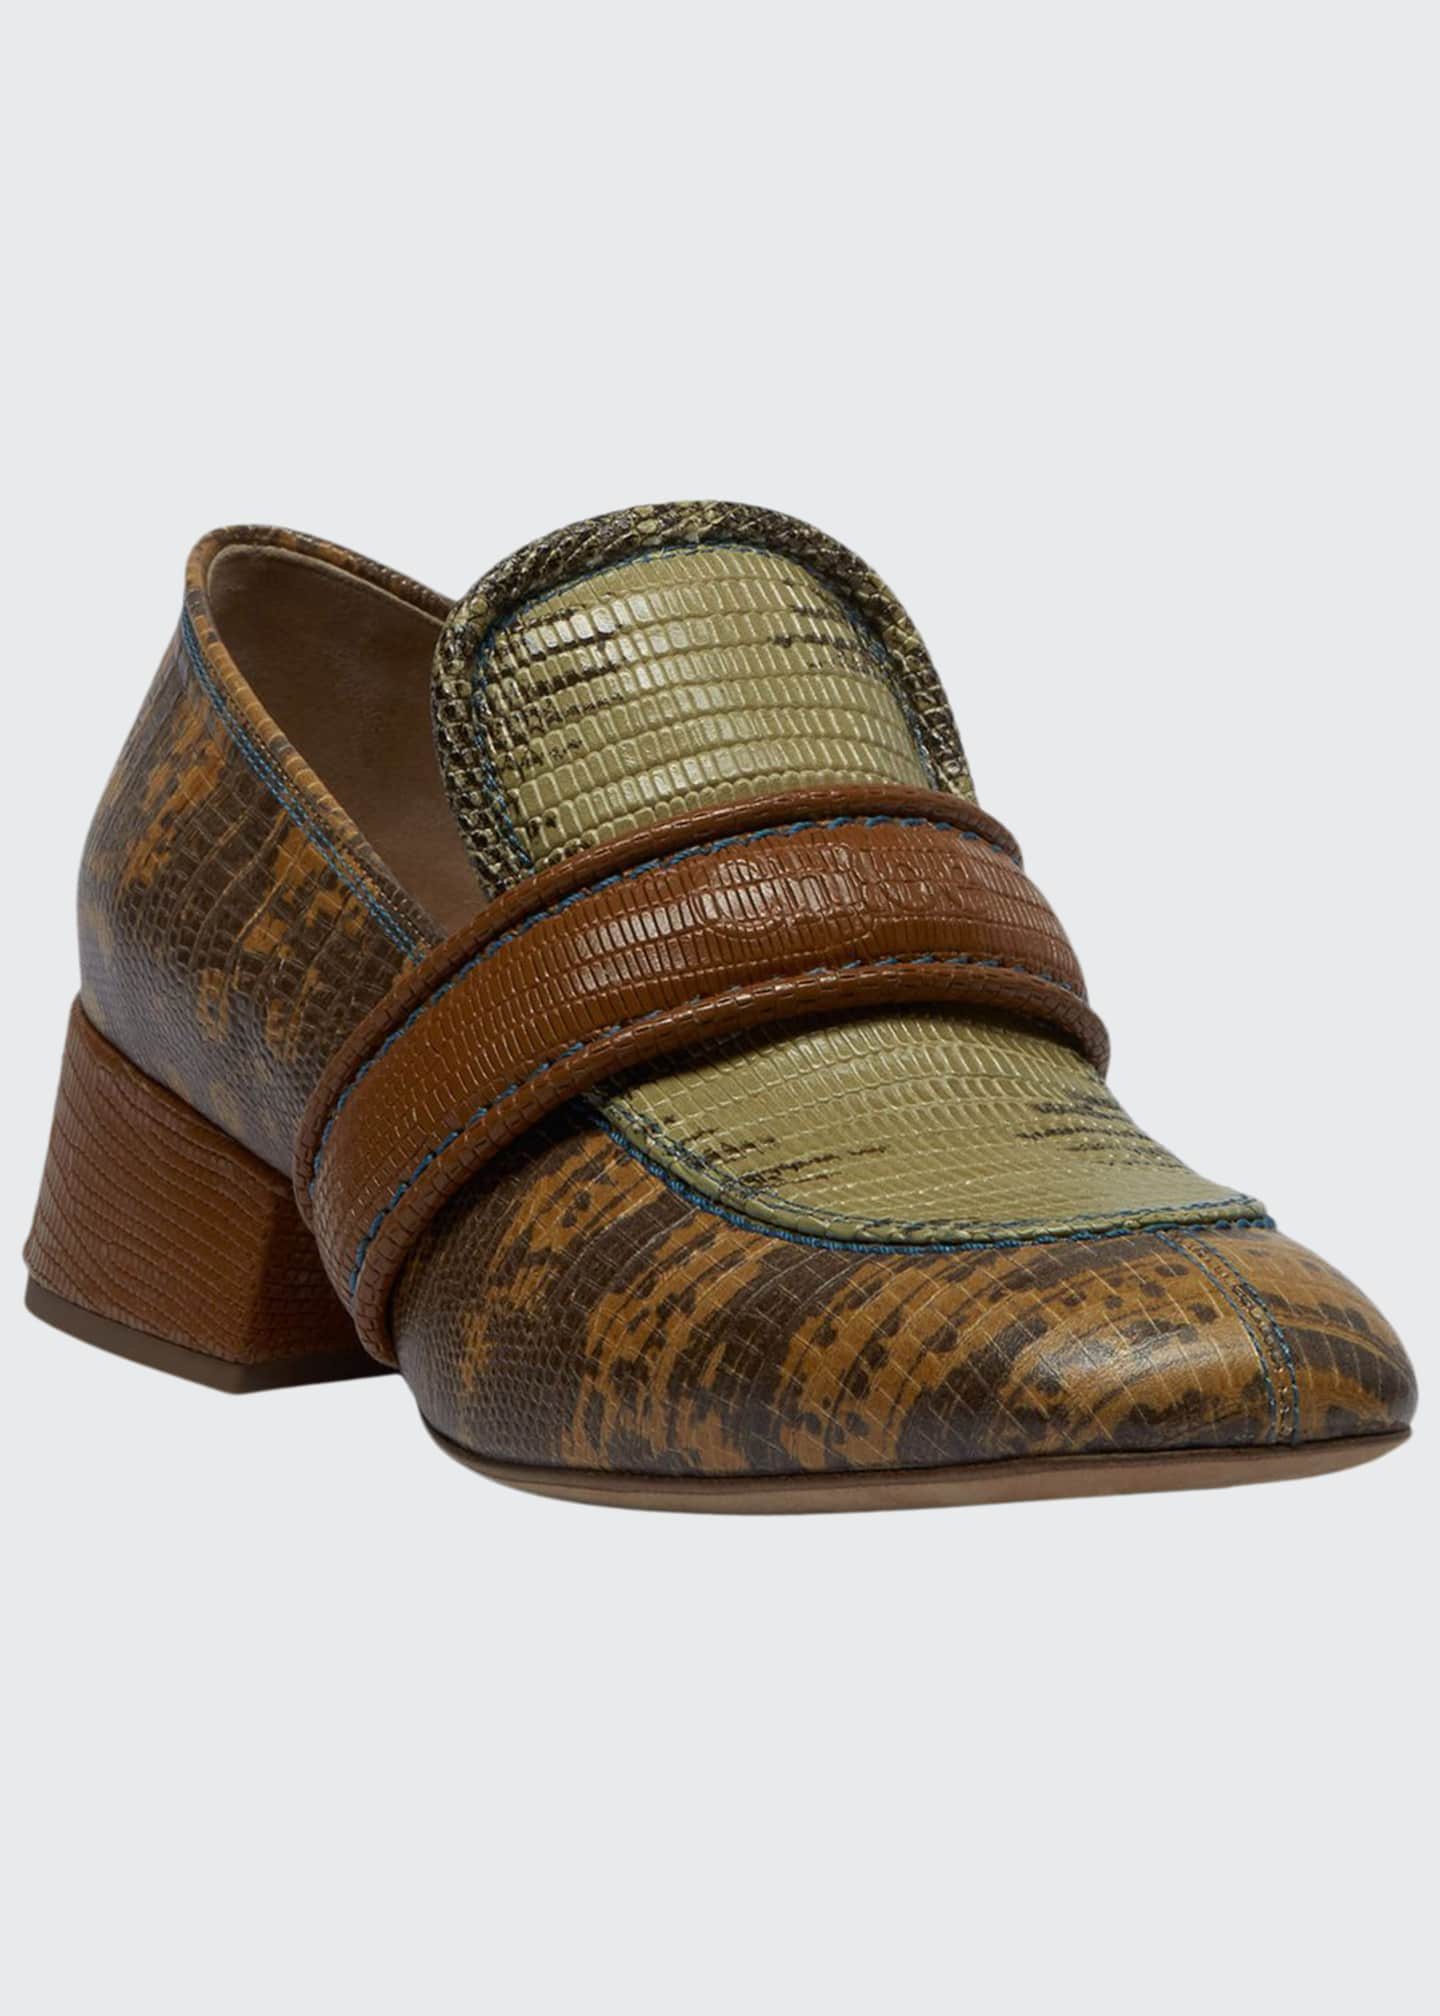 Chloe Cheryl Short Exotic Loafers